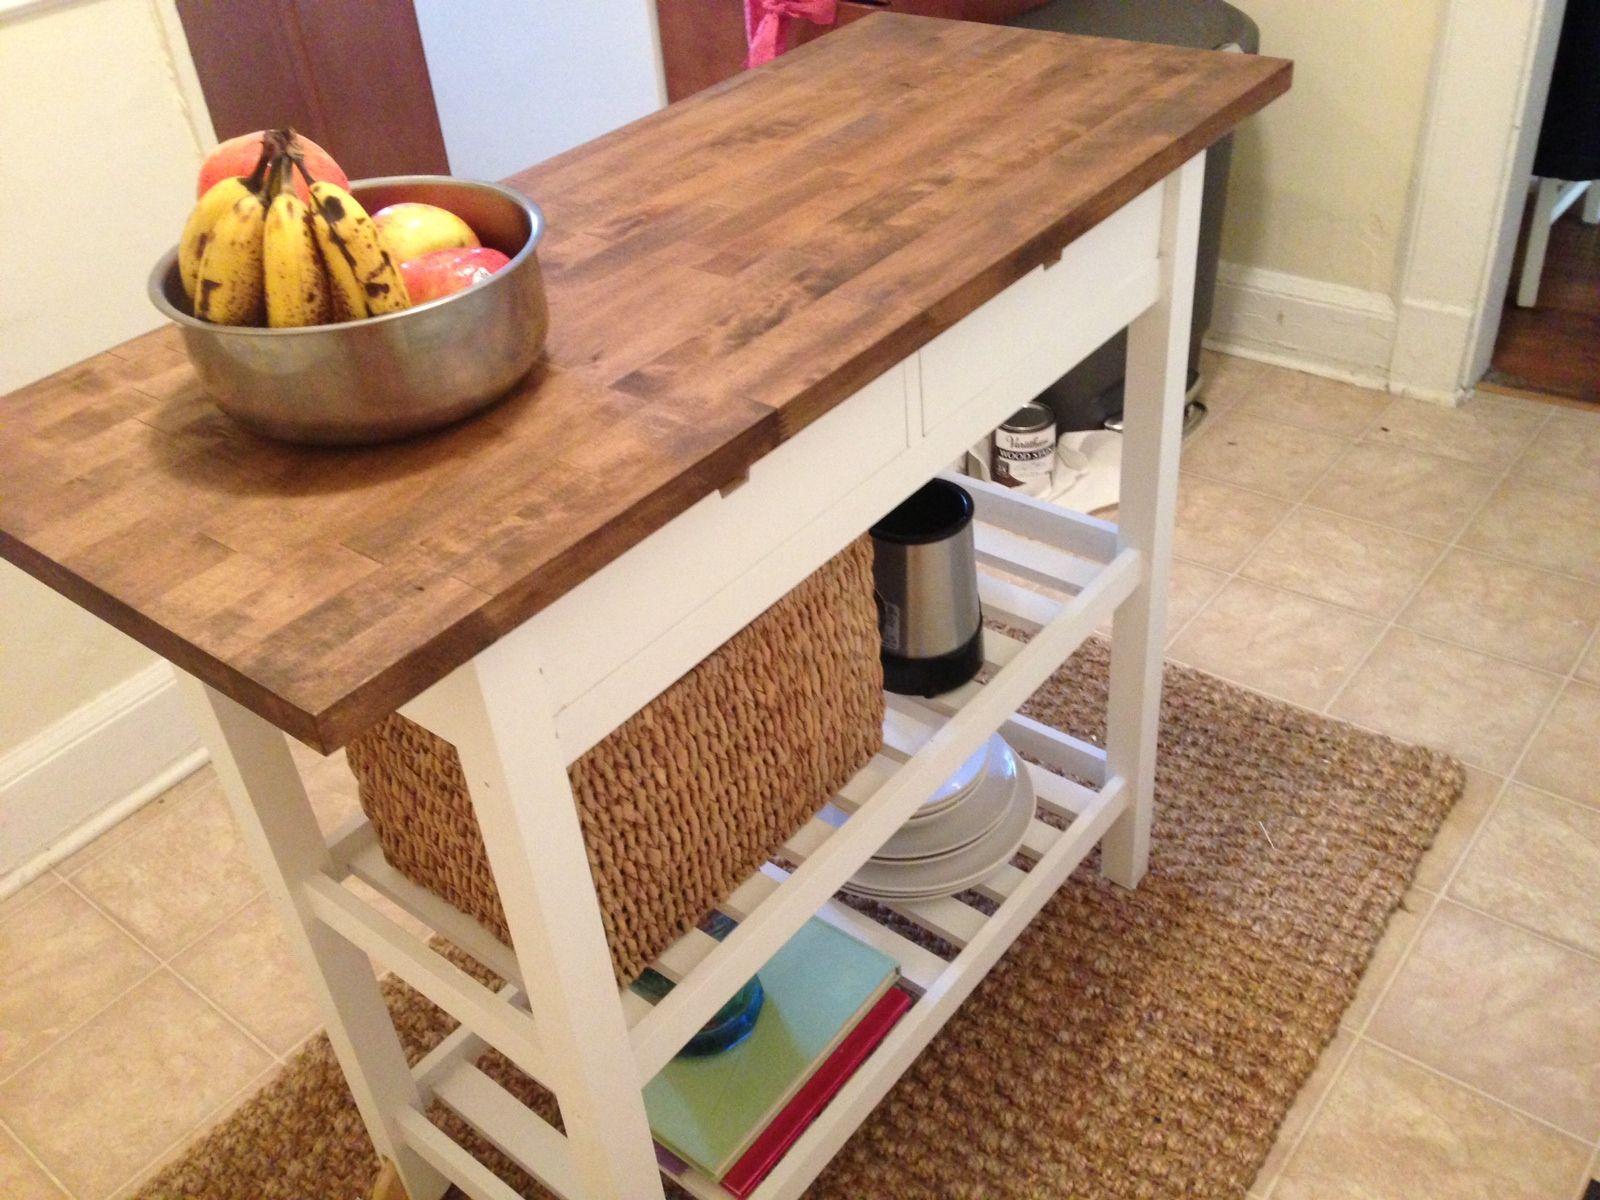 personnaliser la desserte f rh ja ikea ikea kitchen cart and kitchen carts. Black Bedroom Furniture Sets. Home Design Ideas